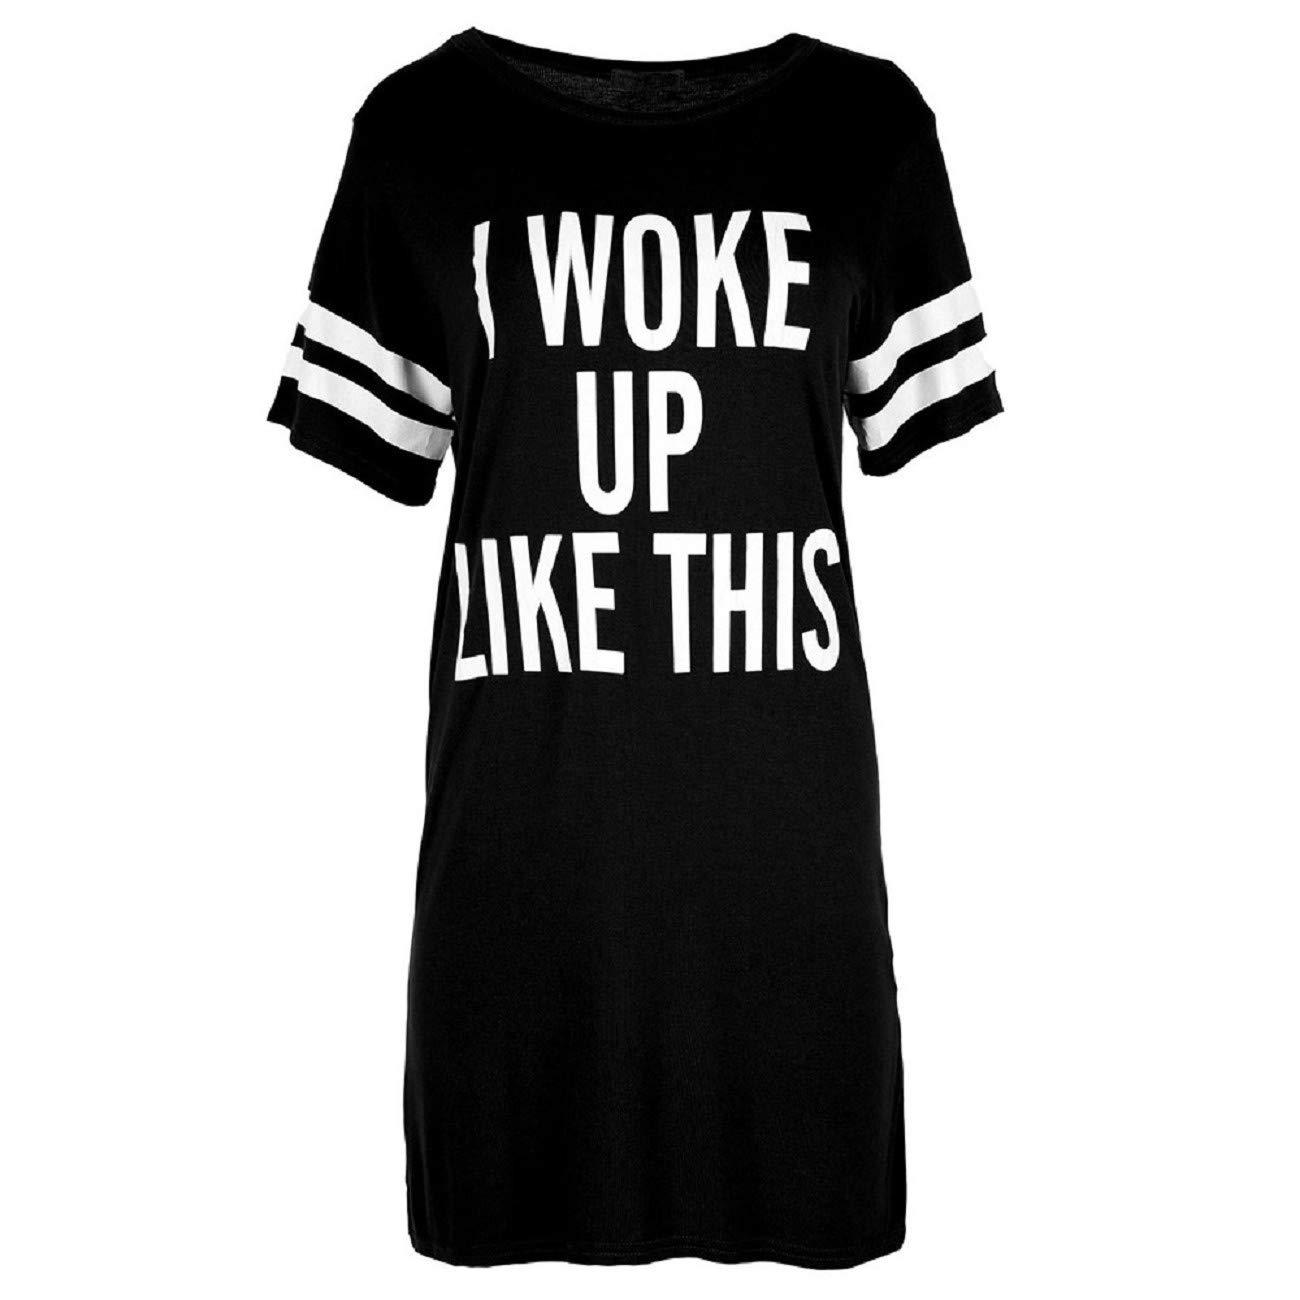 FAPIZI Women Plus Size T-Shirt Letter Print Top Summer O-Neck Loose Casual Tunic Night Dress